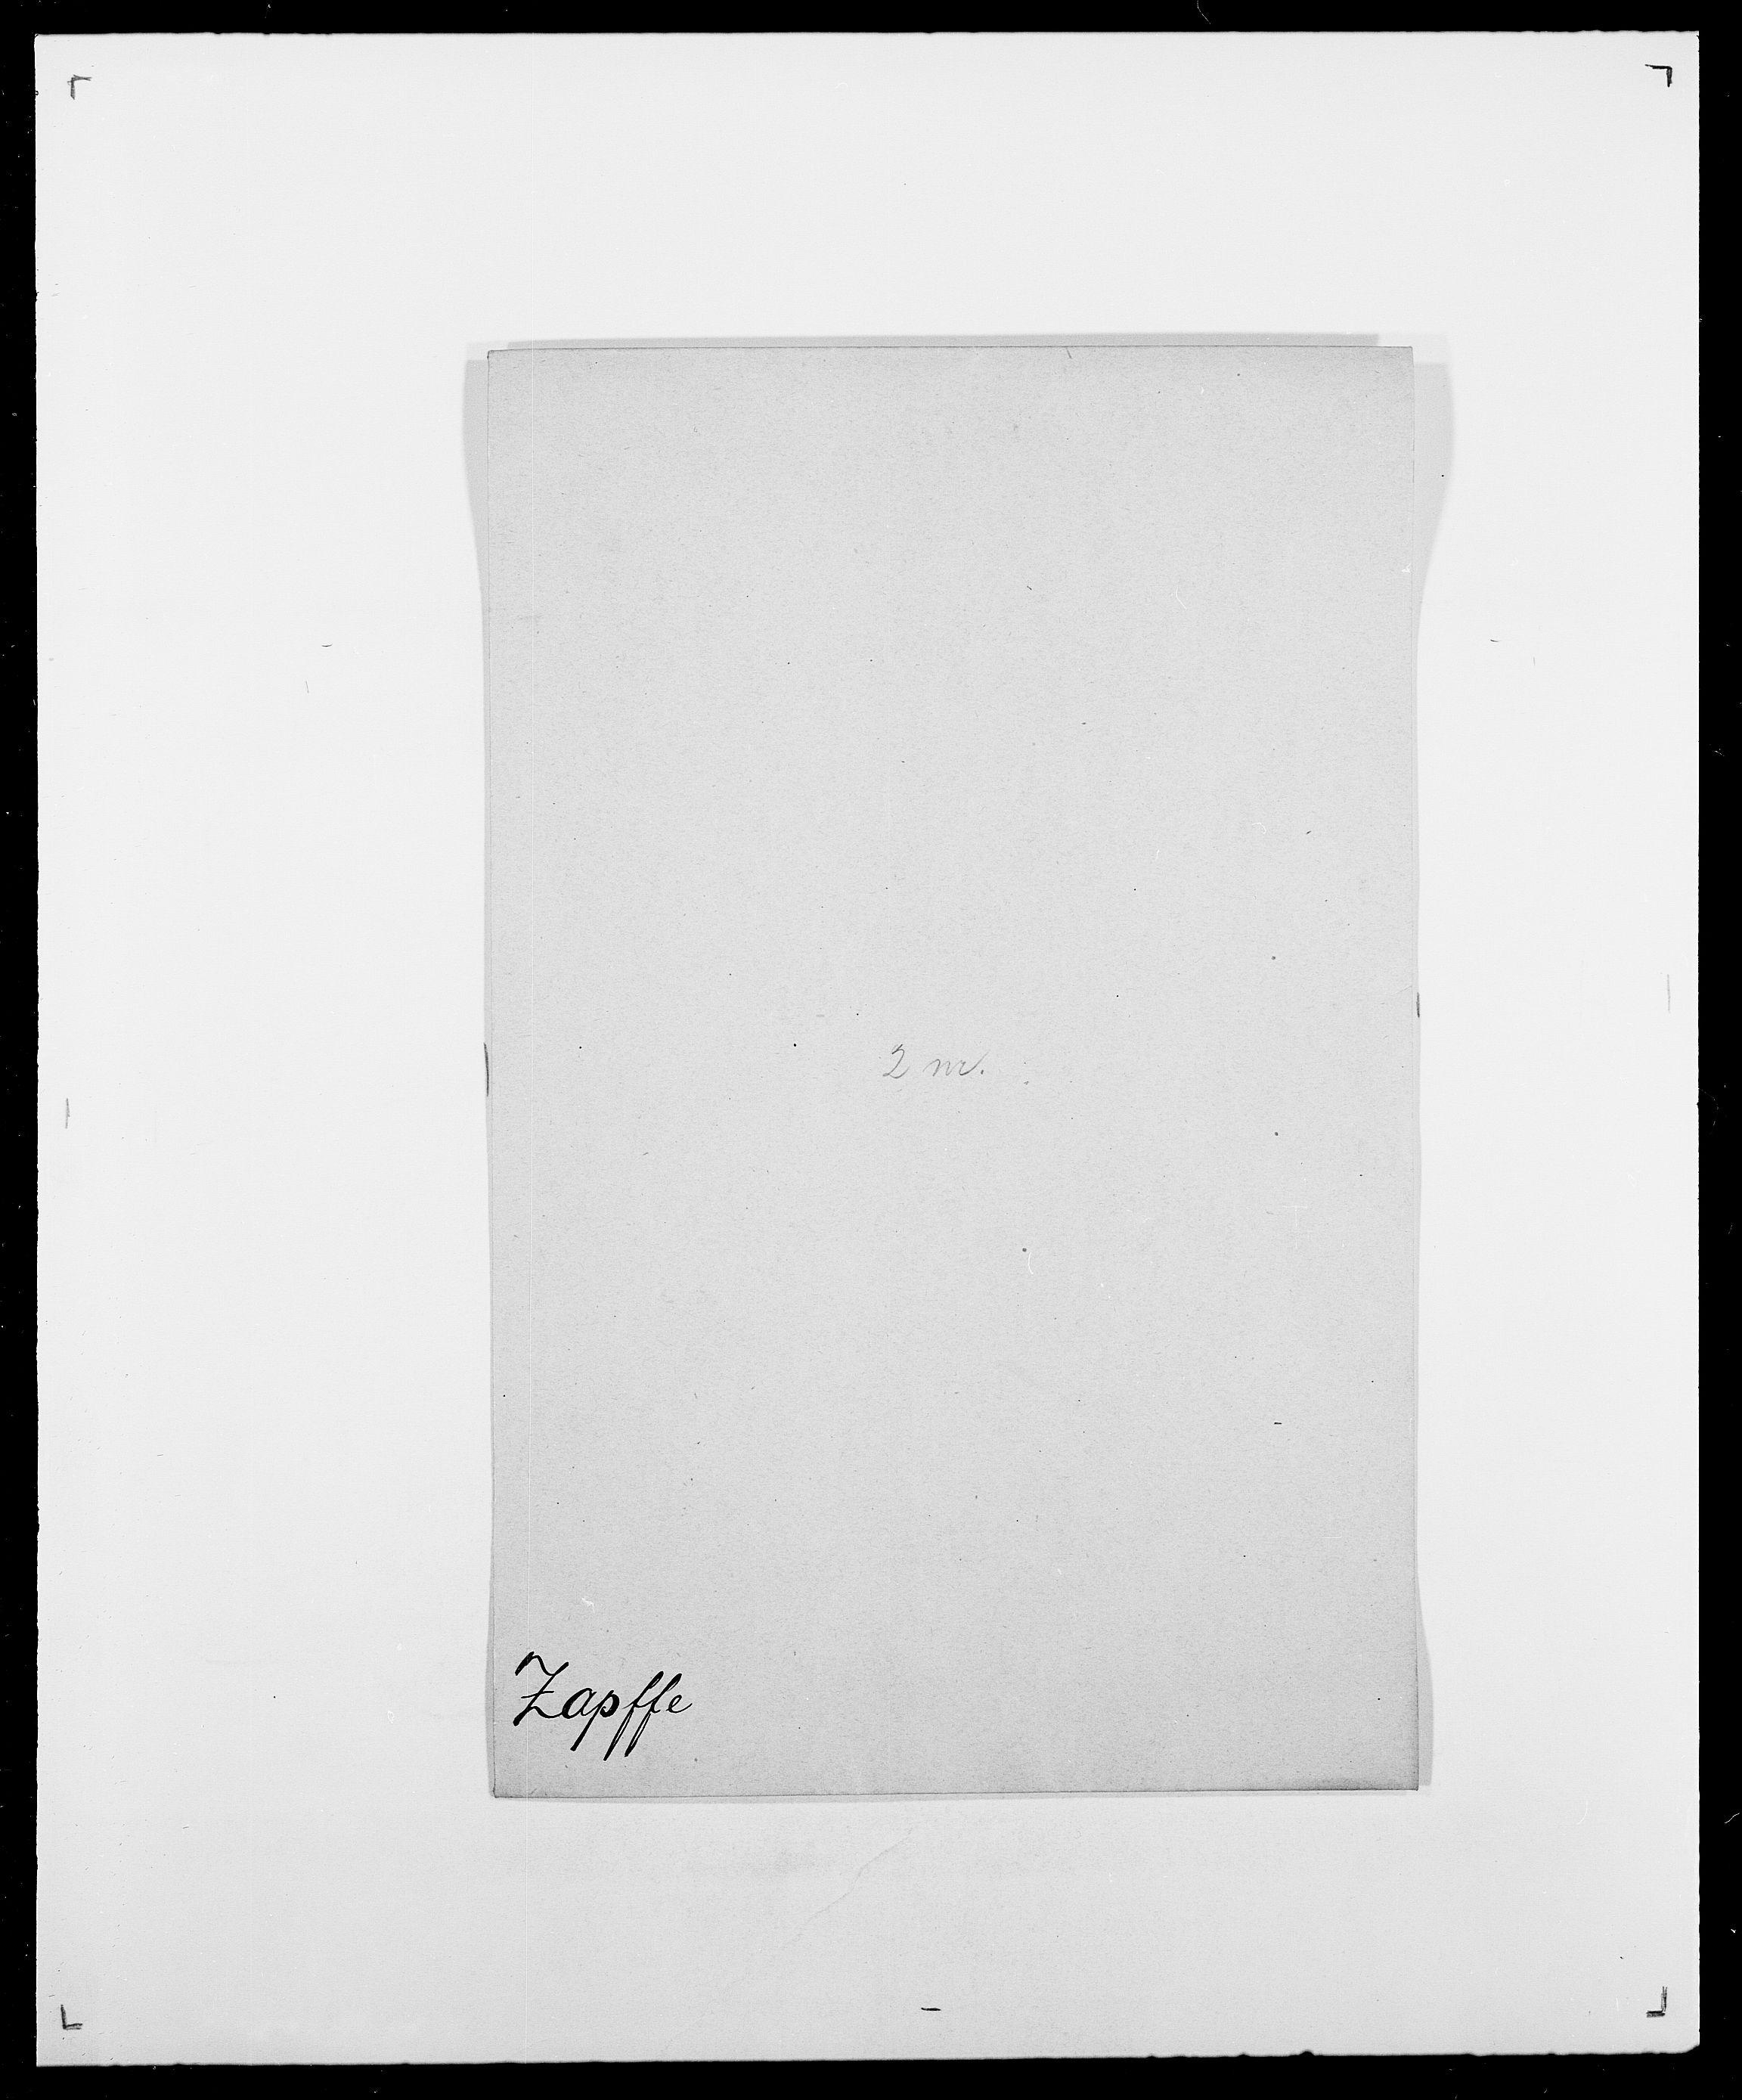 SAO, Delgobe, Charles Antoine - samling, D/Da/L0043: Wulfsberg - v. Zanten, s. 94